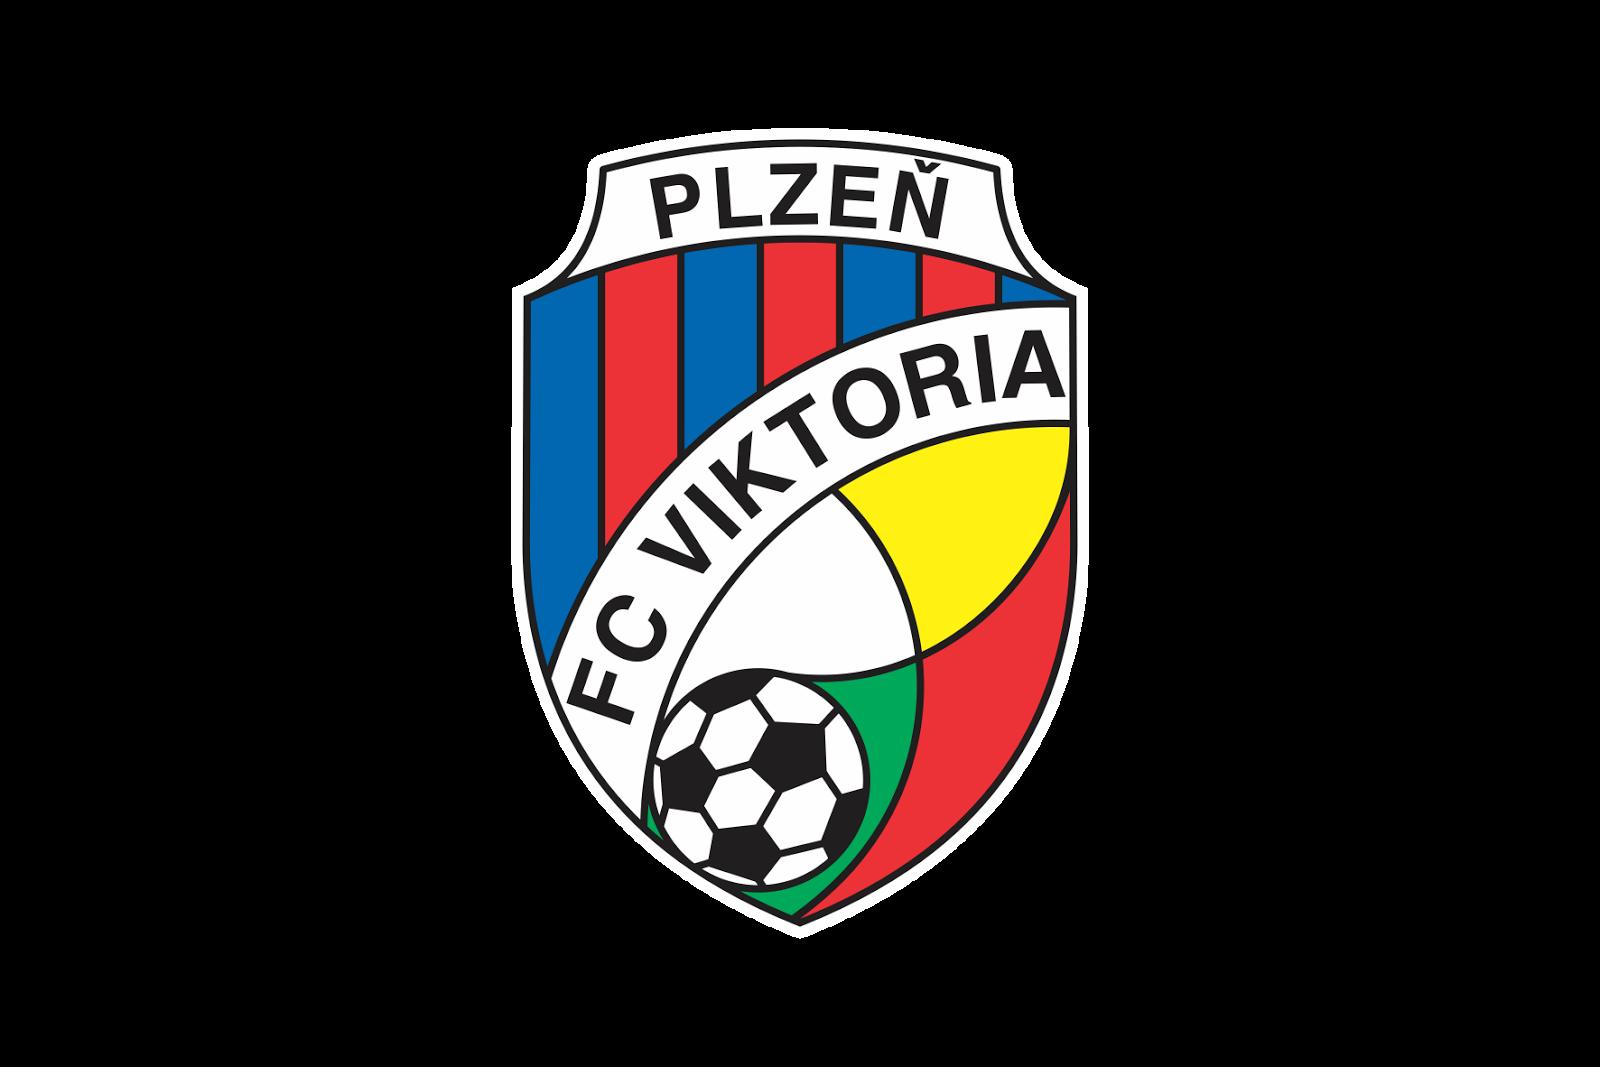 fc viktoria plzen logo vector football logos vector football designs